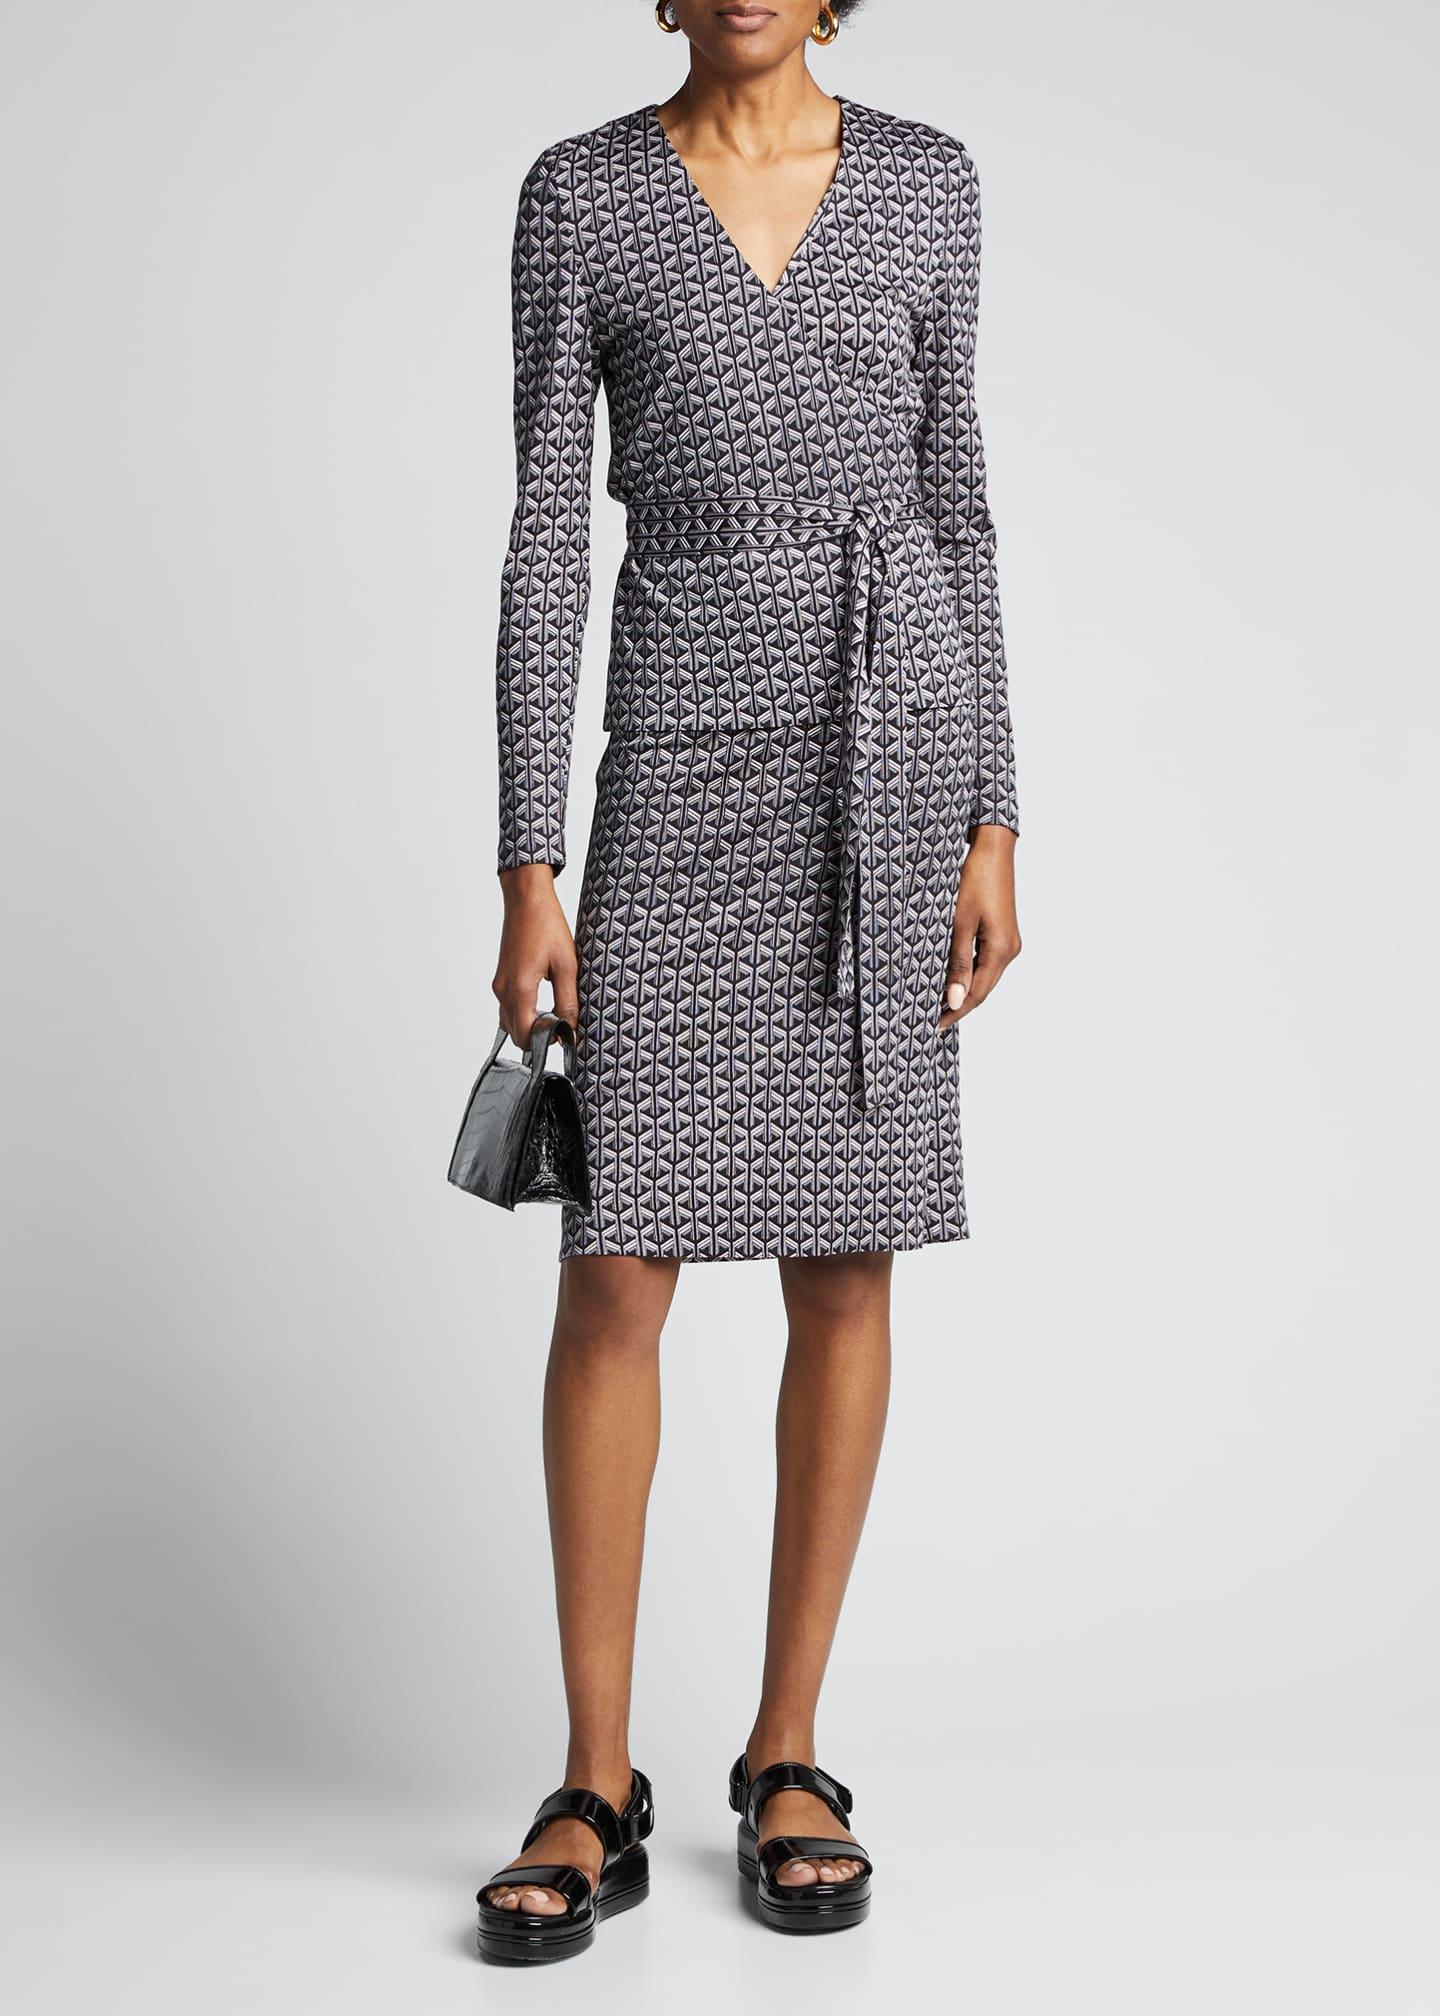 Diane von Furstenberg Karis Geo-Print Long-Sleeve Wrap Dress